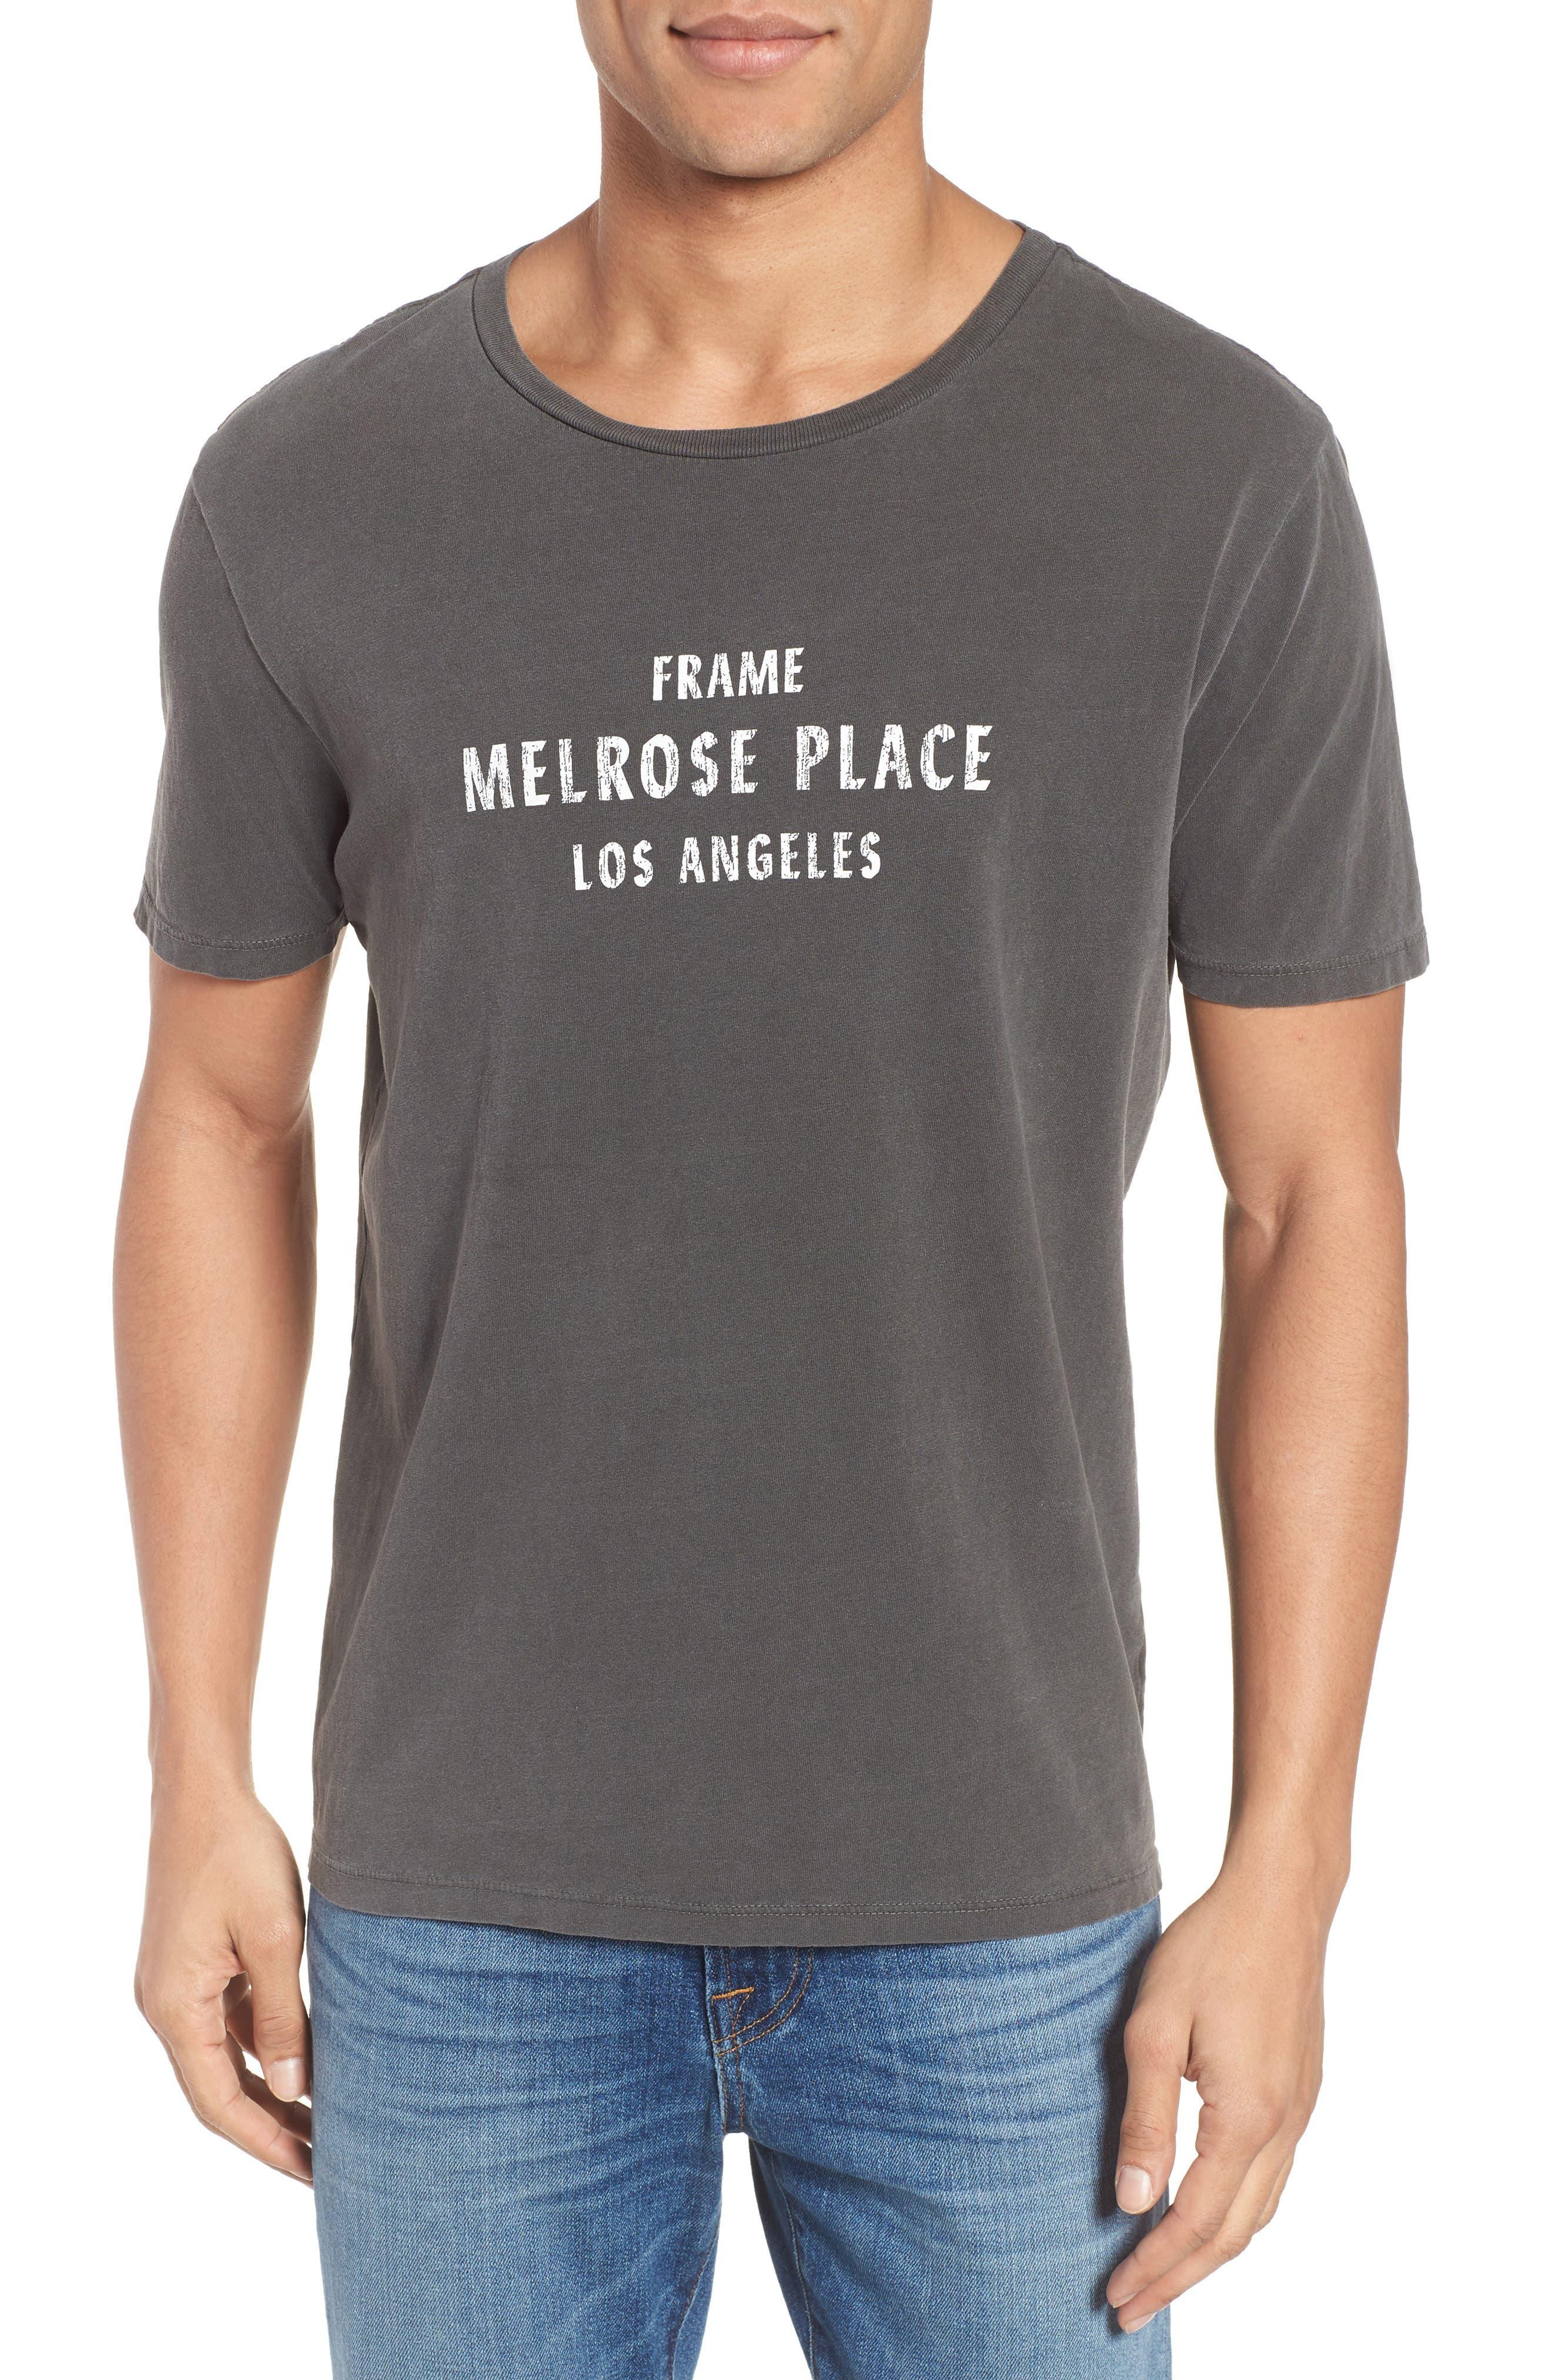 FRAME Melrose Place Vintage Graphic T-Shirt